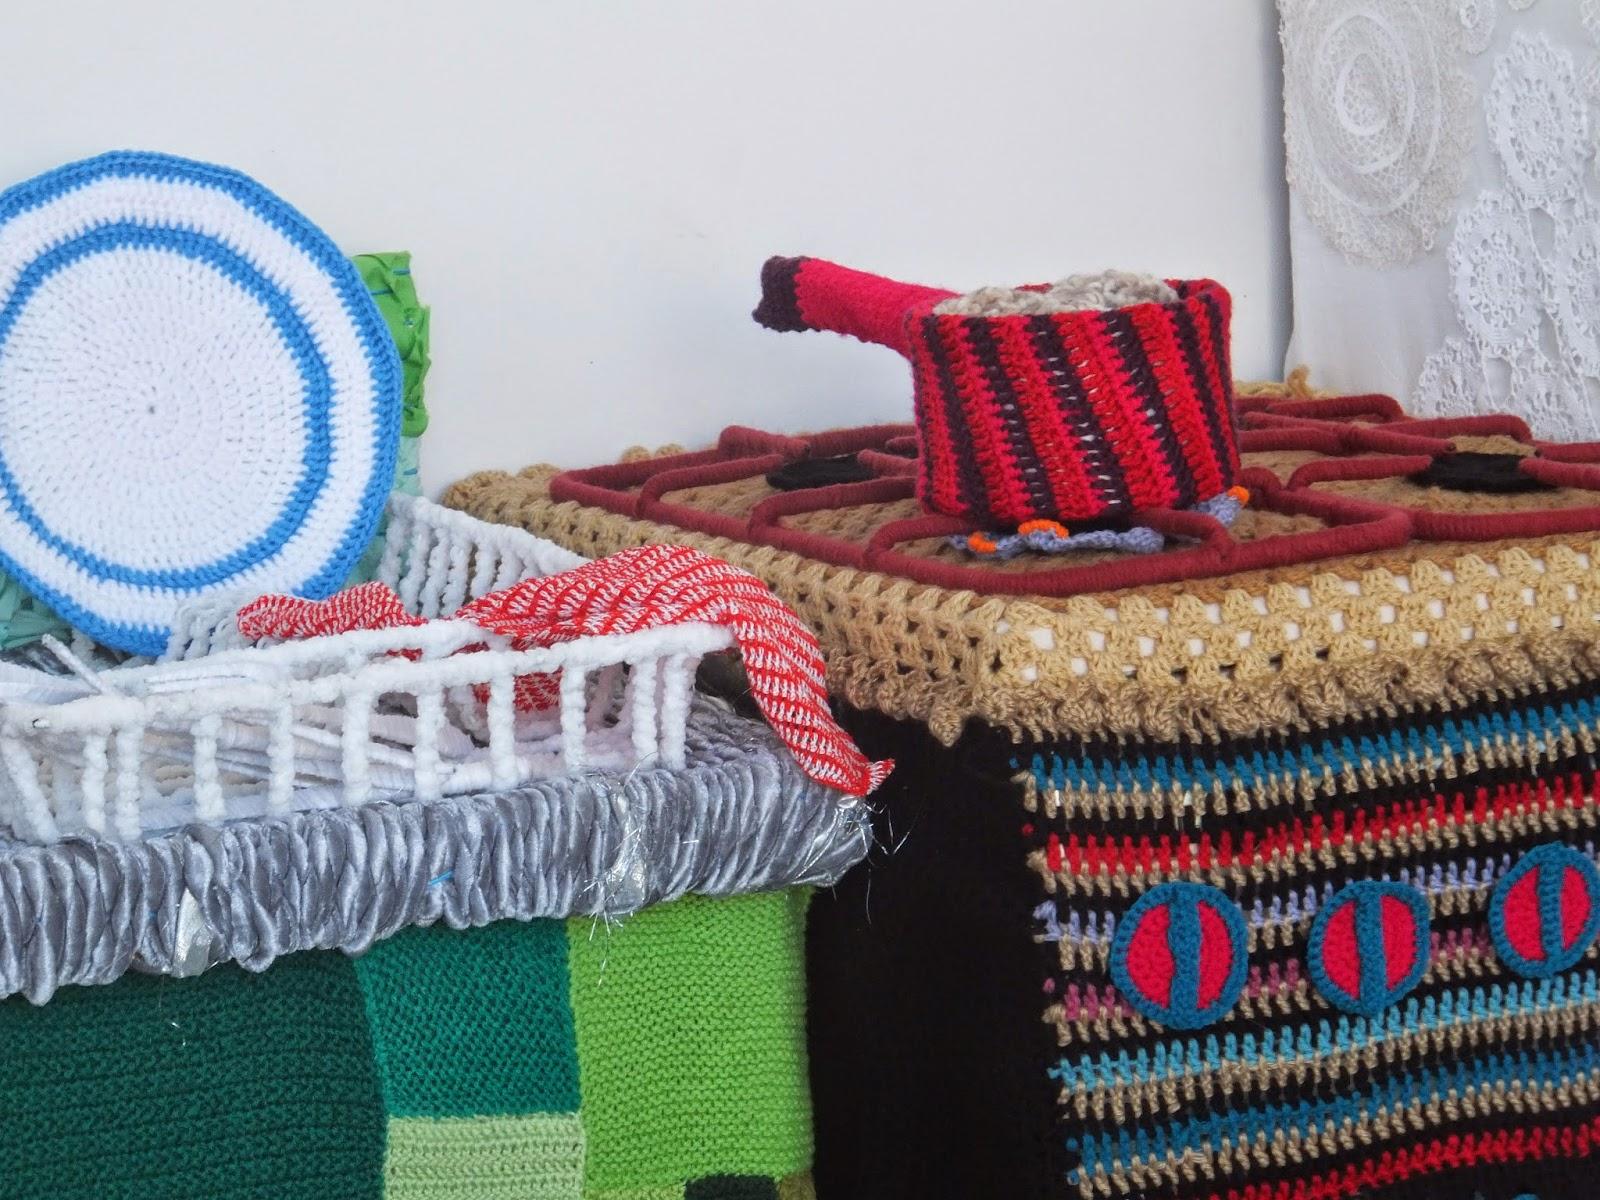 yarn-bombing-warwick-art-gallery-10